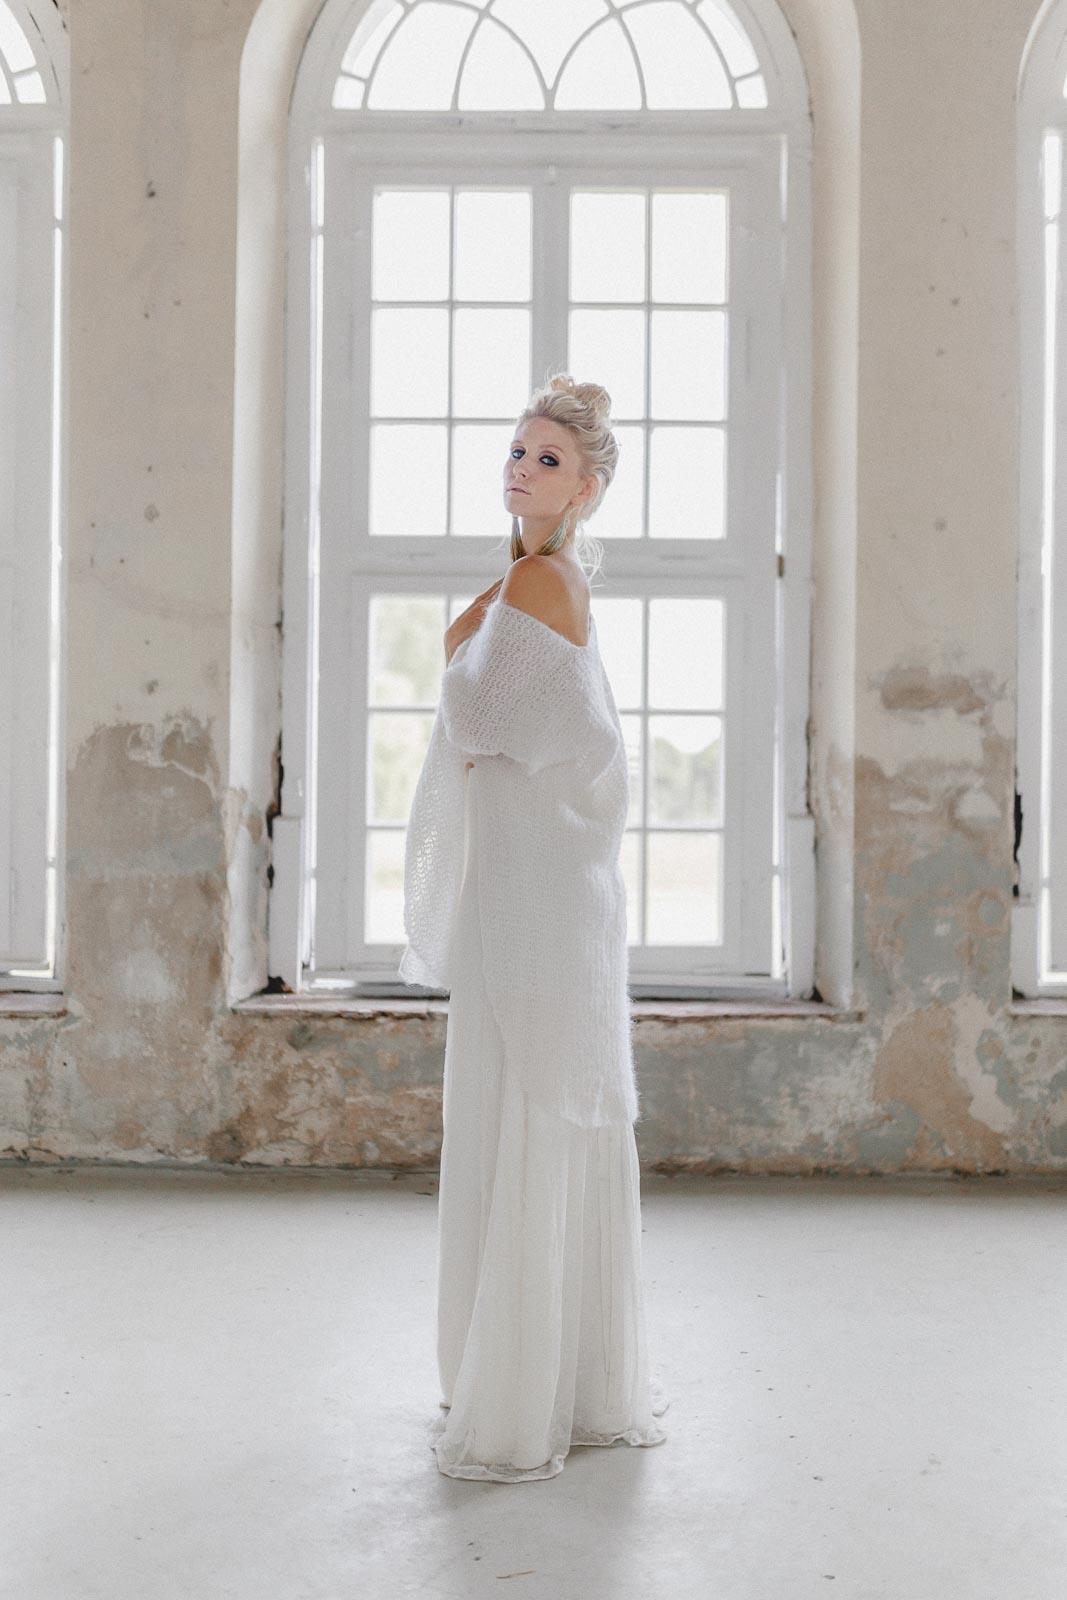 40_SoeurCoeur_Kollektion_2018_Bohoforlife_marryandbride_web